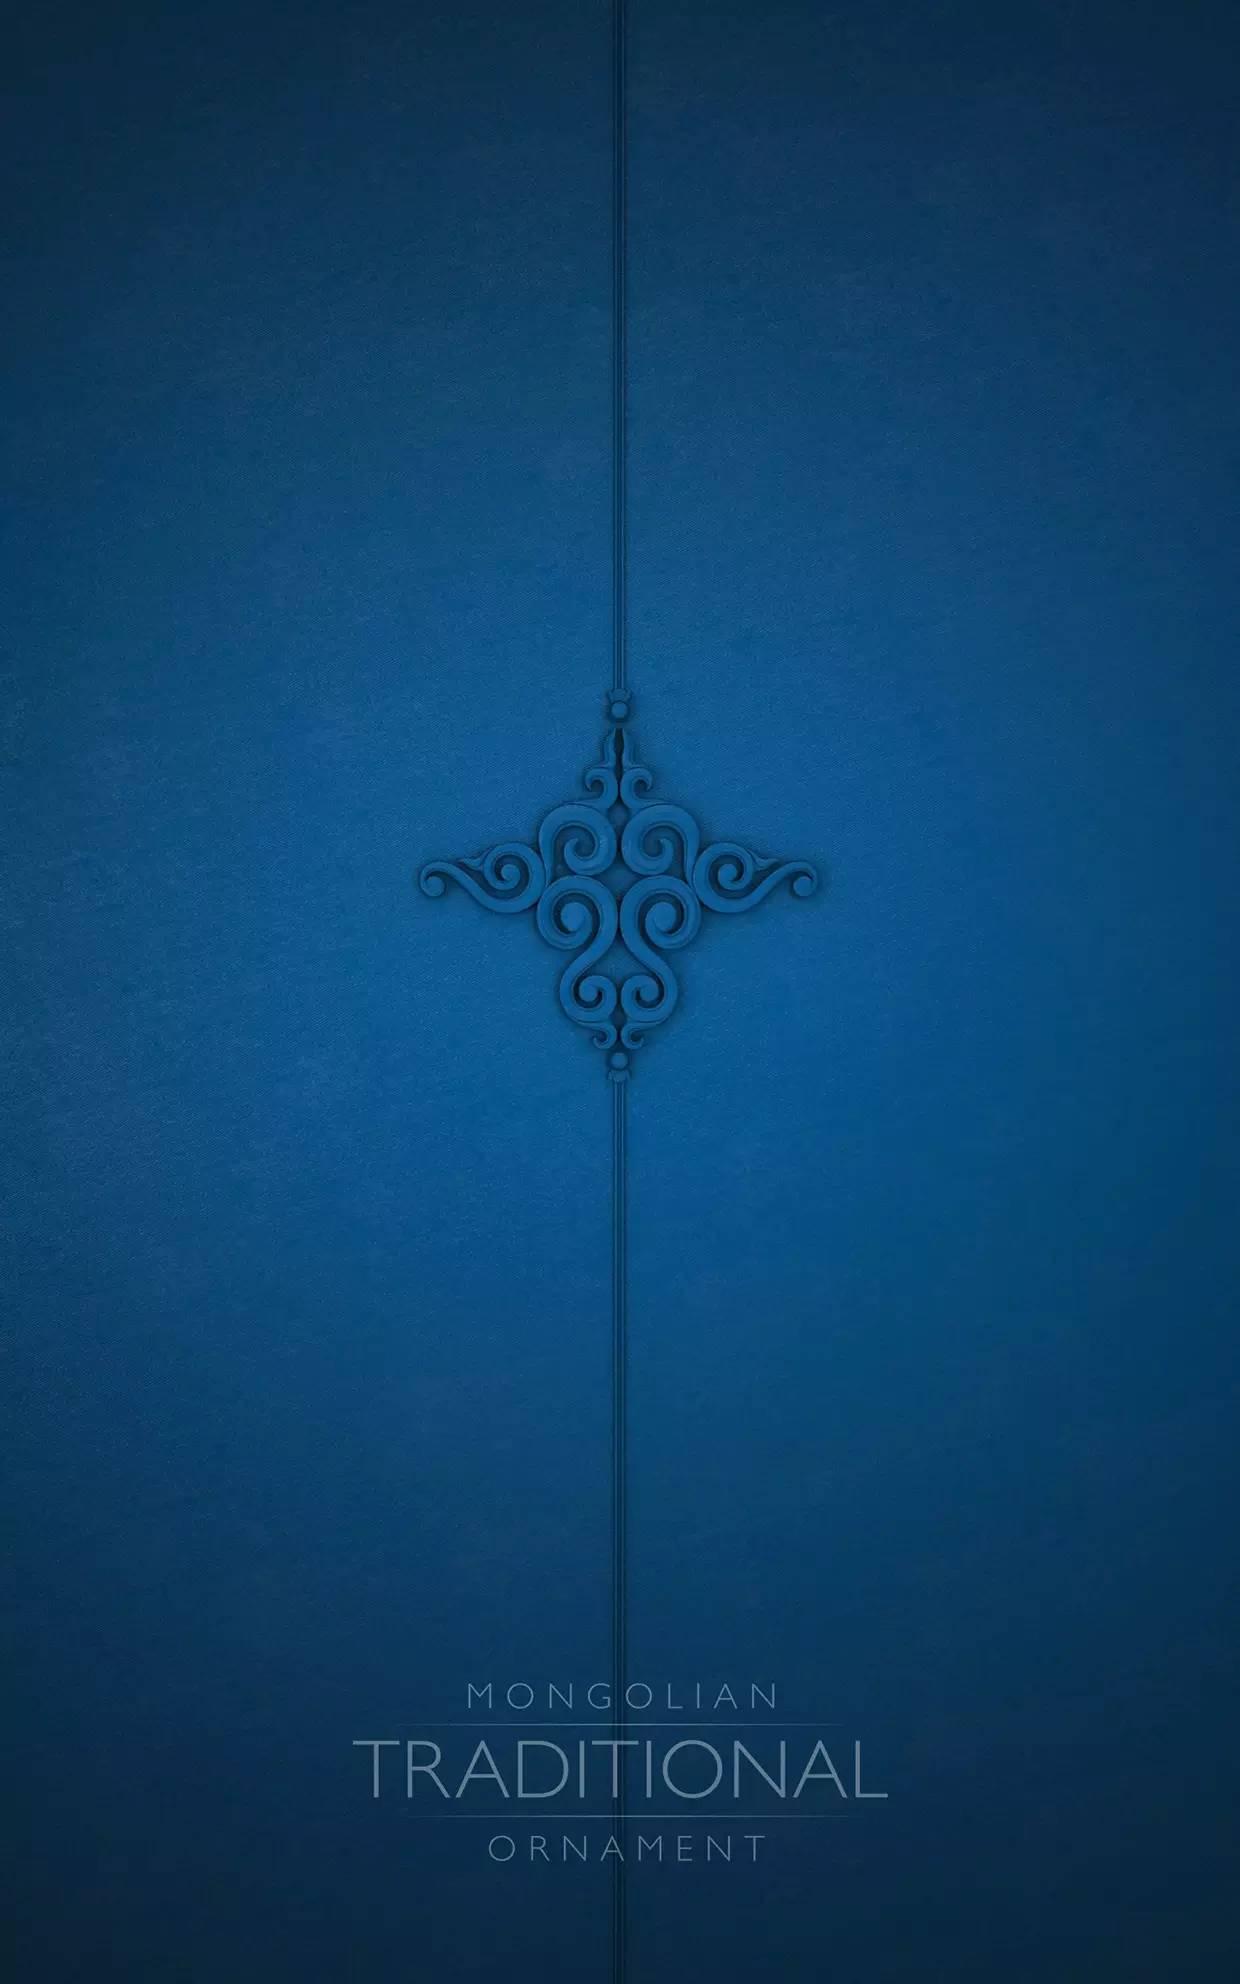 室内设计|蒙族传统装饰(Mongolian Traditional Ornament) 第5张